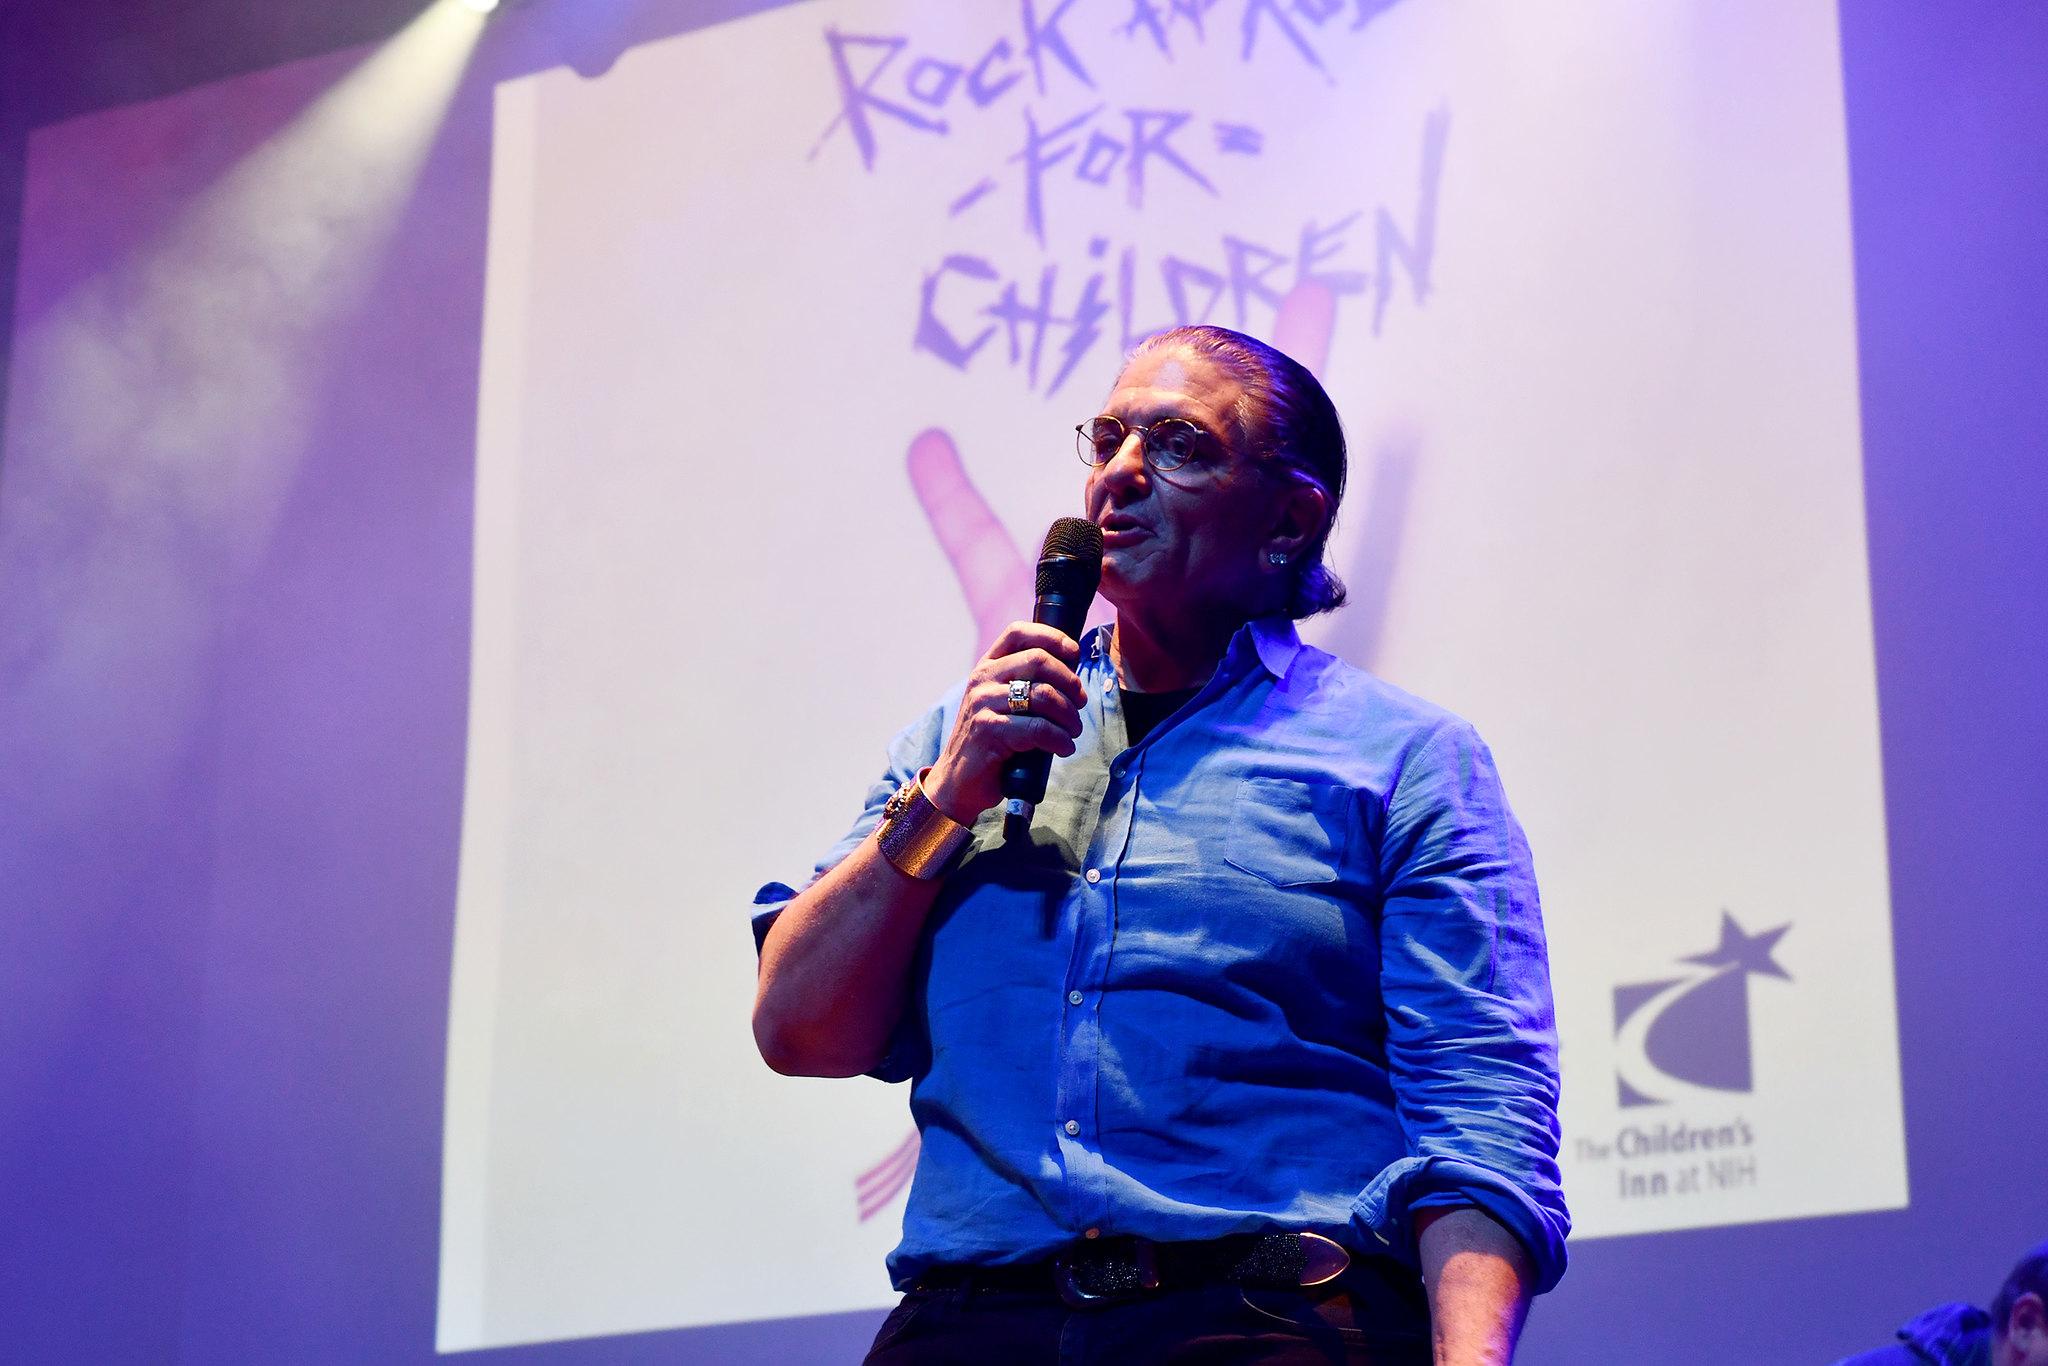 Jon Belinke of the RRFC foundation speaks